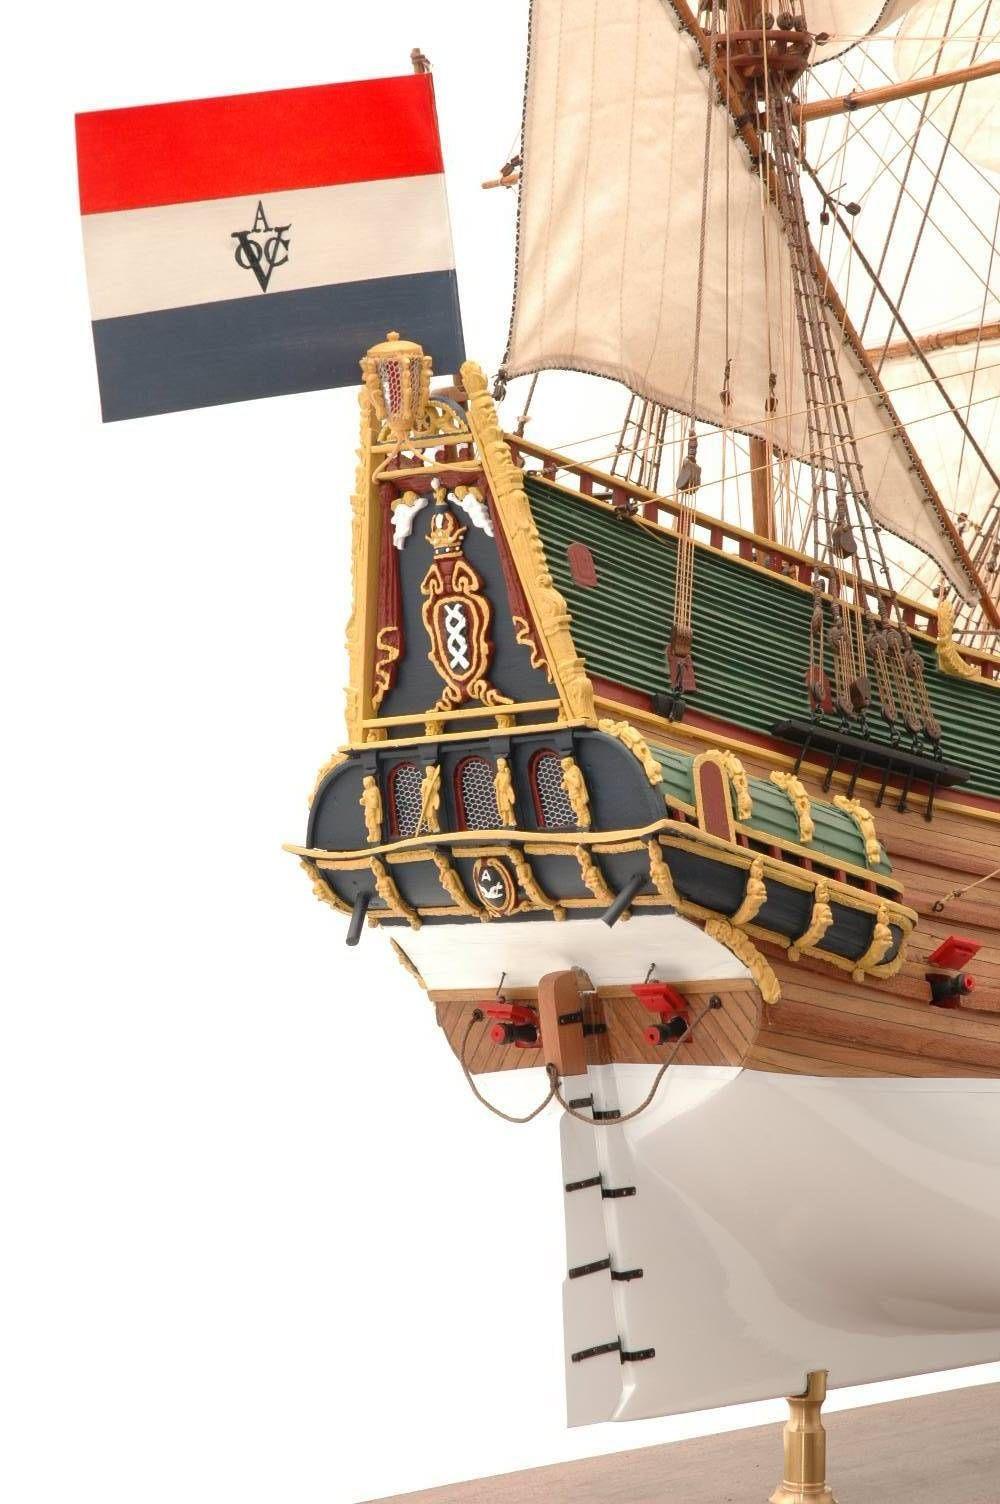 228-6951-Batavia-model-ship-Premier-Range